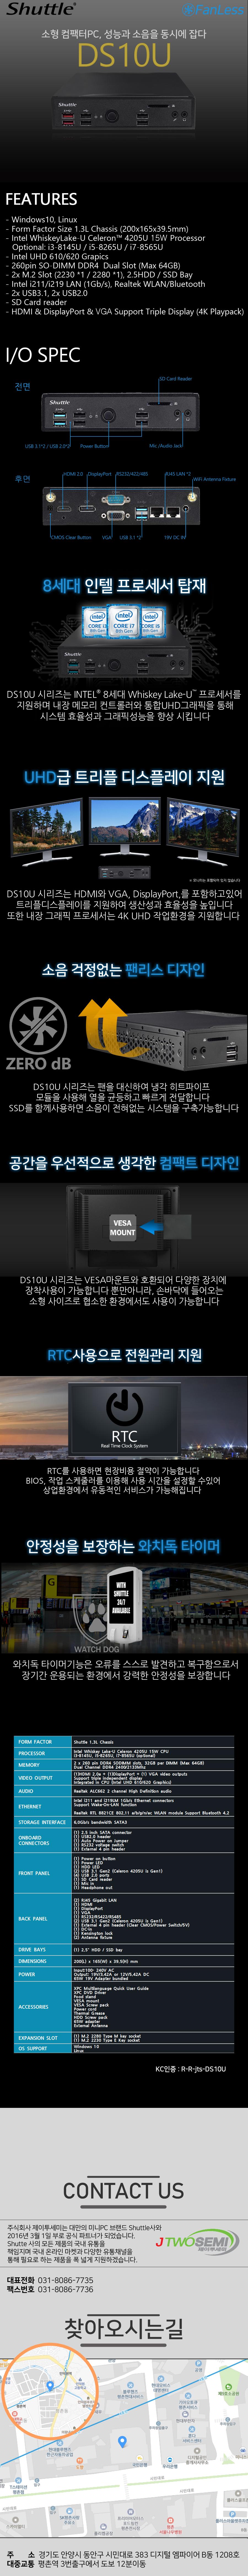 Shuttle DS10U WIN10 IoT (8GB, M2 256GB)